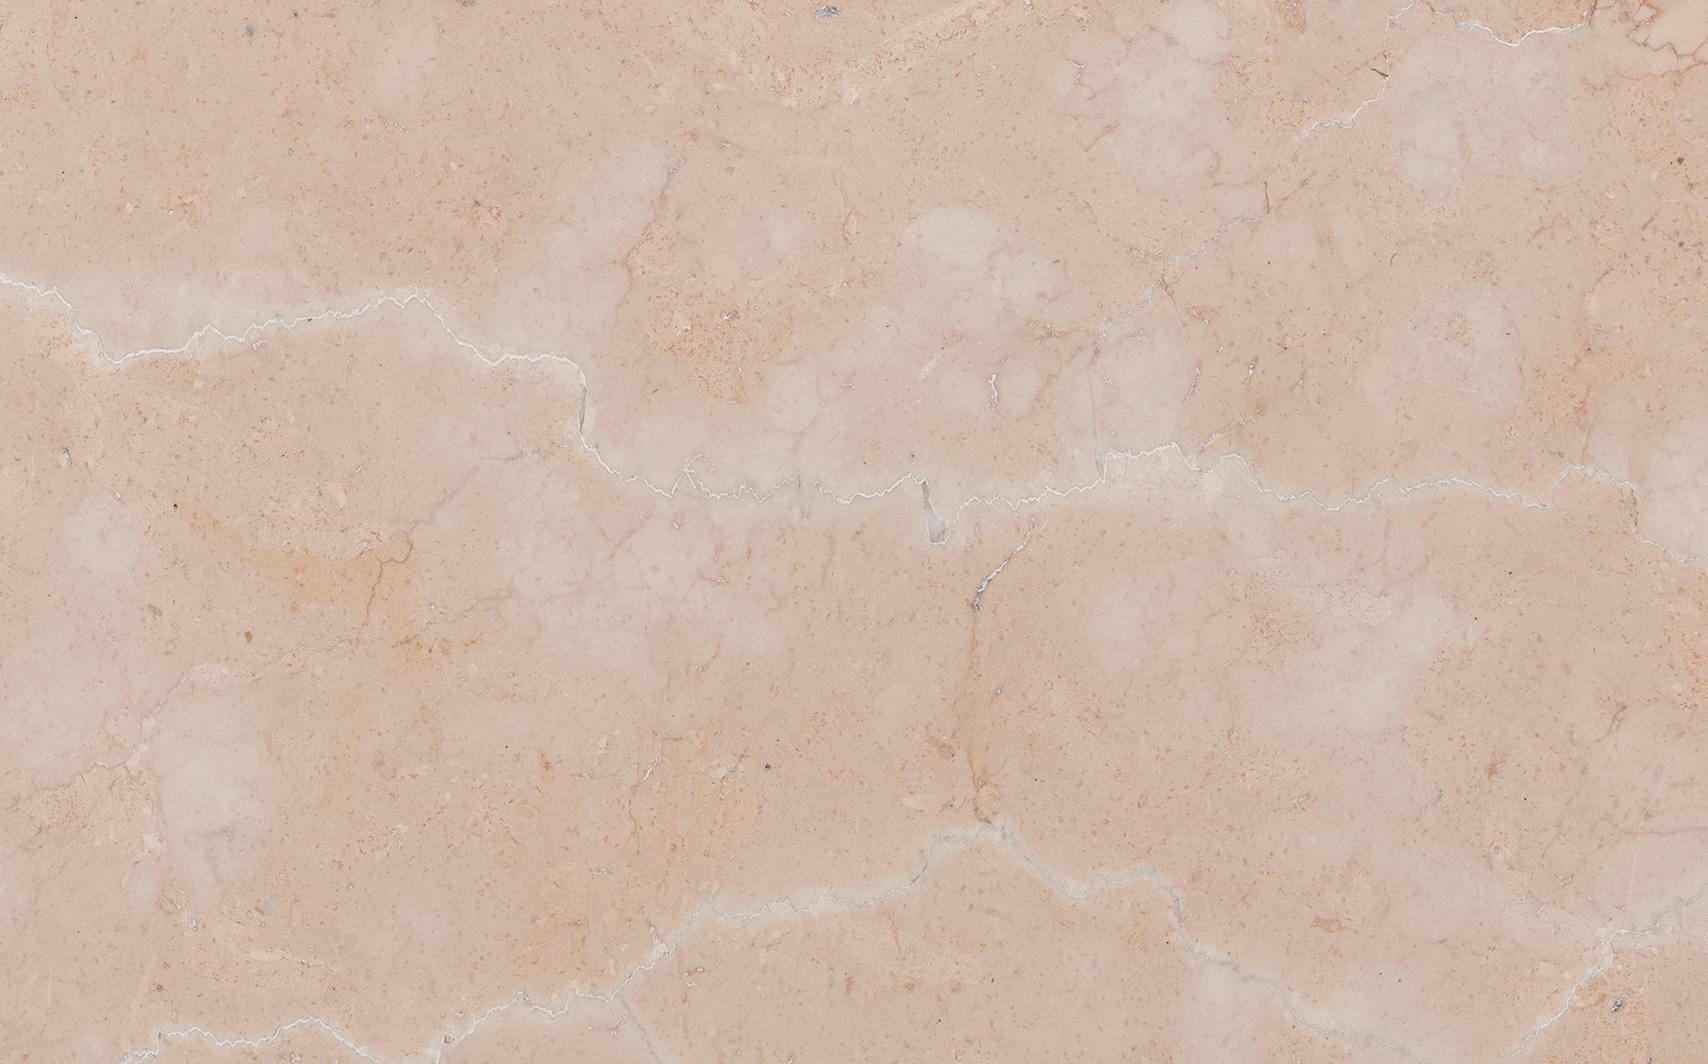 Quintarelli Pietre e Marmi: Lessinia Stone, Verdello Trento, Rosso Trento The enduring beauty of nature Pink Lessinia Stone